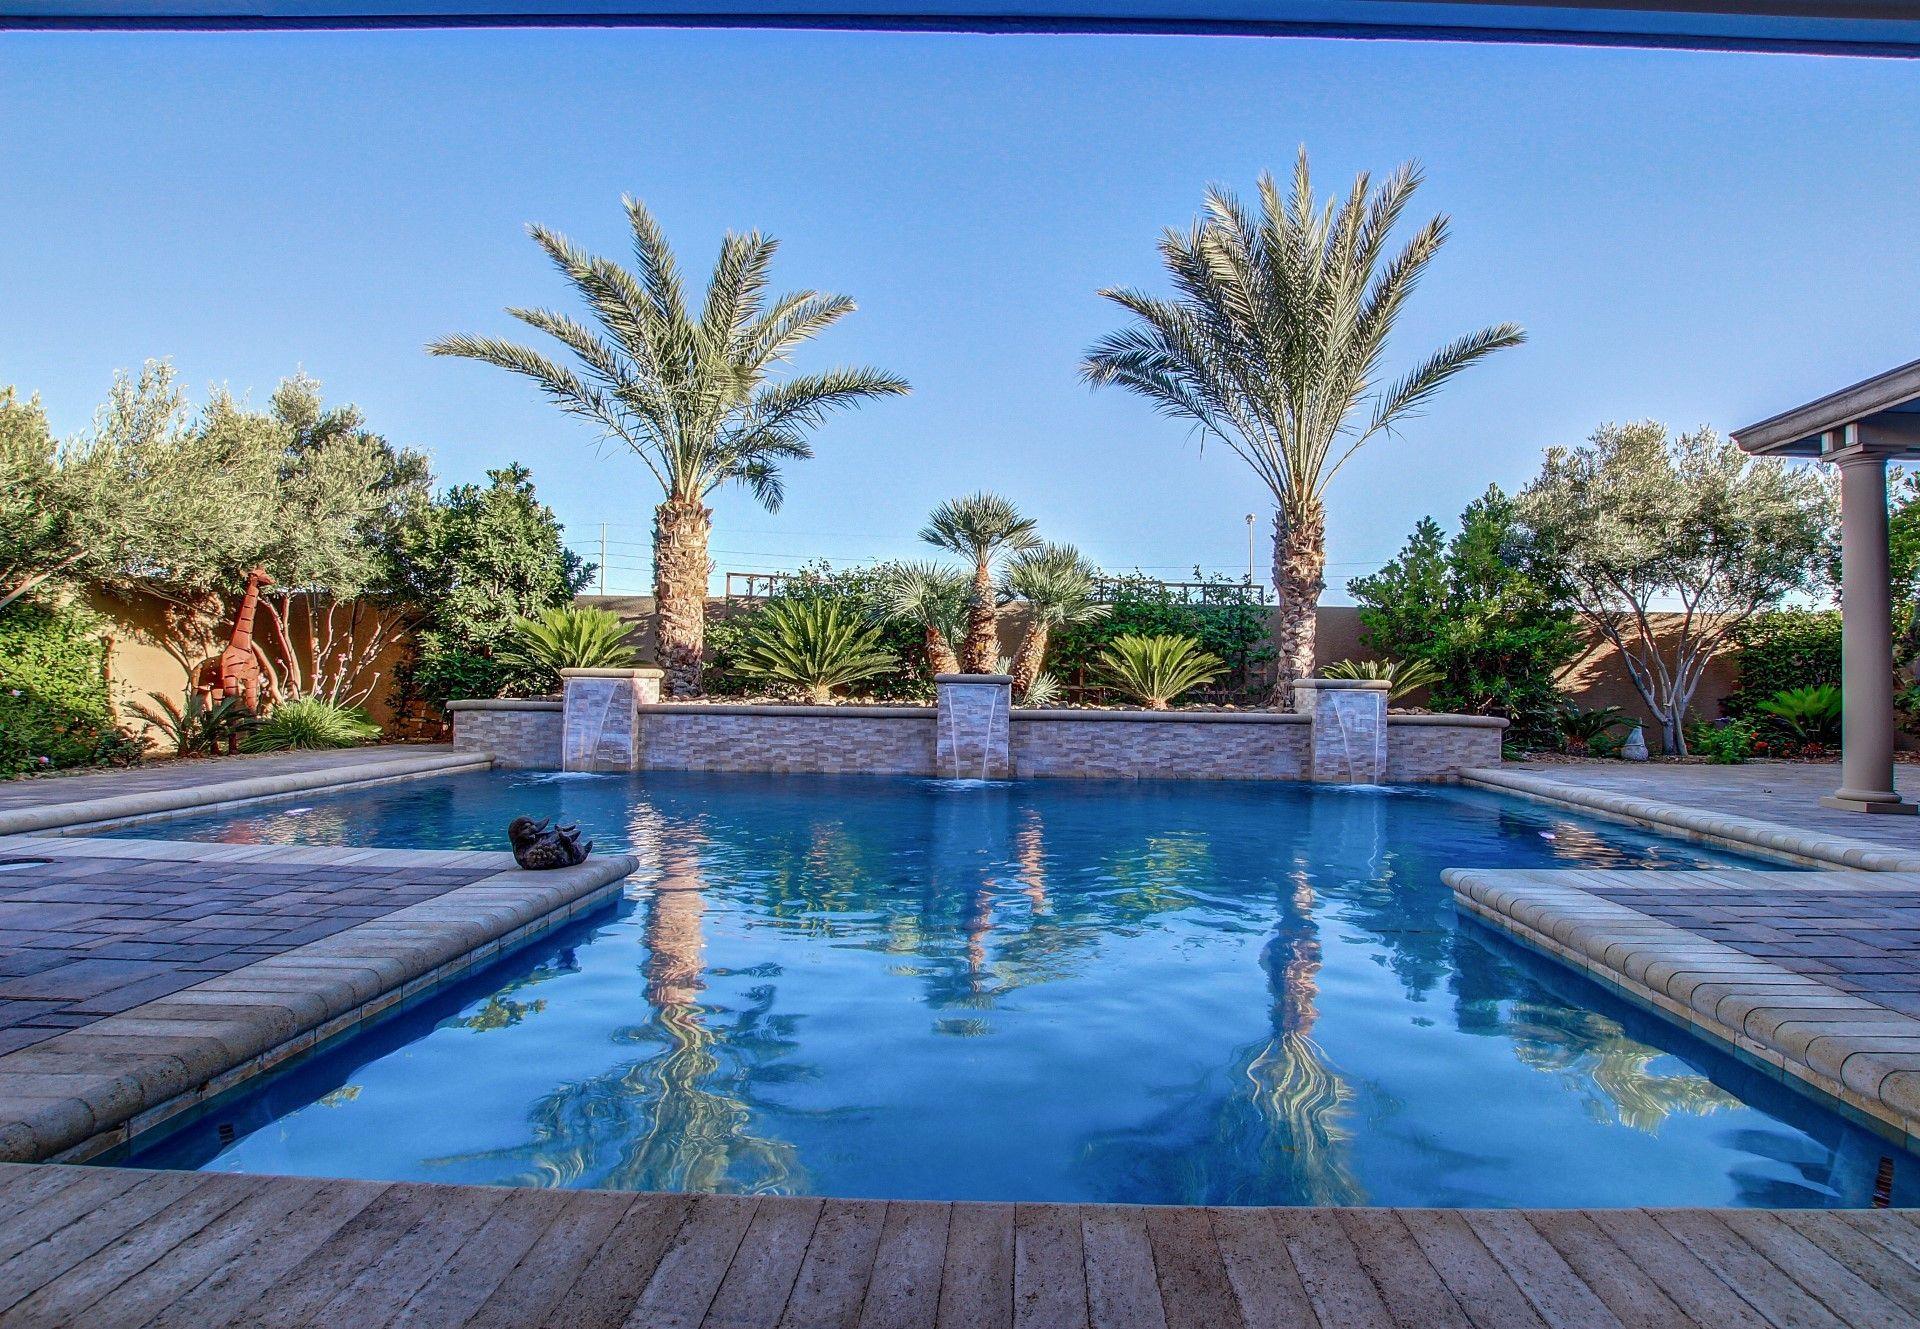 Beautiful Pool Design Nw Las Vegas Listing Backyard Pool Designs Pool Designs Beautiful Pools